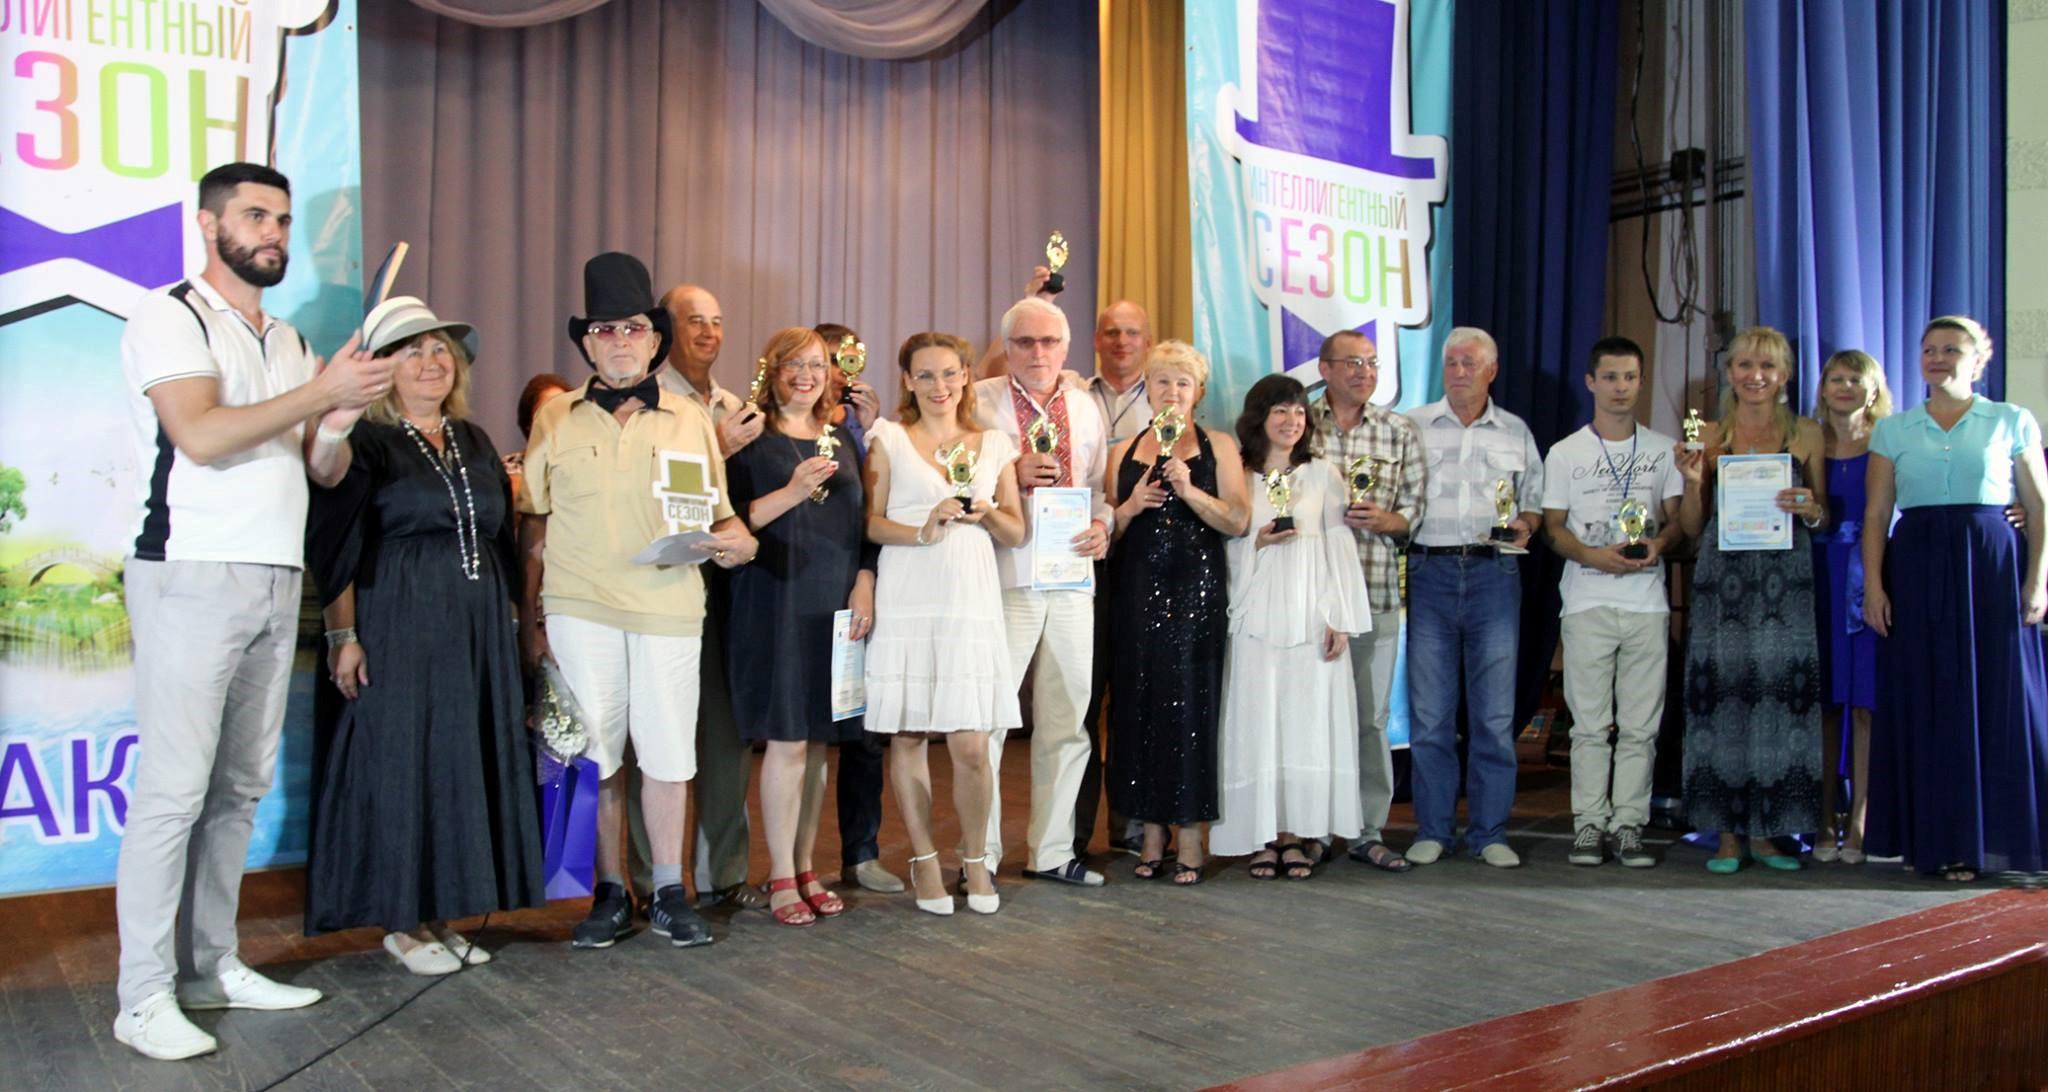 Лауреаты фестиваля и жюри на сцене клуба санатория